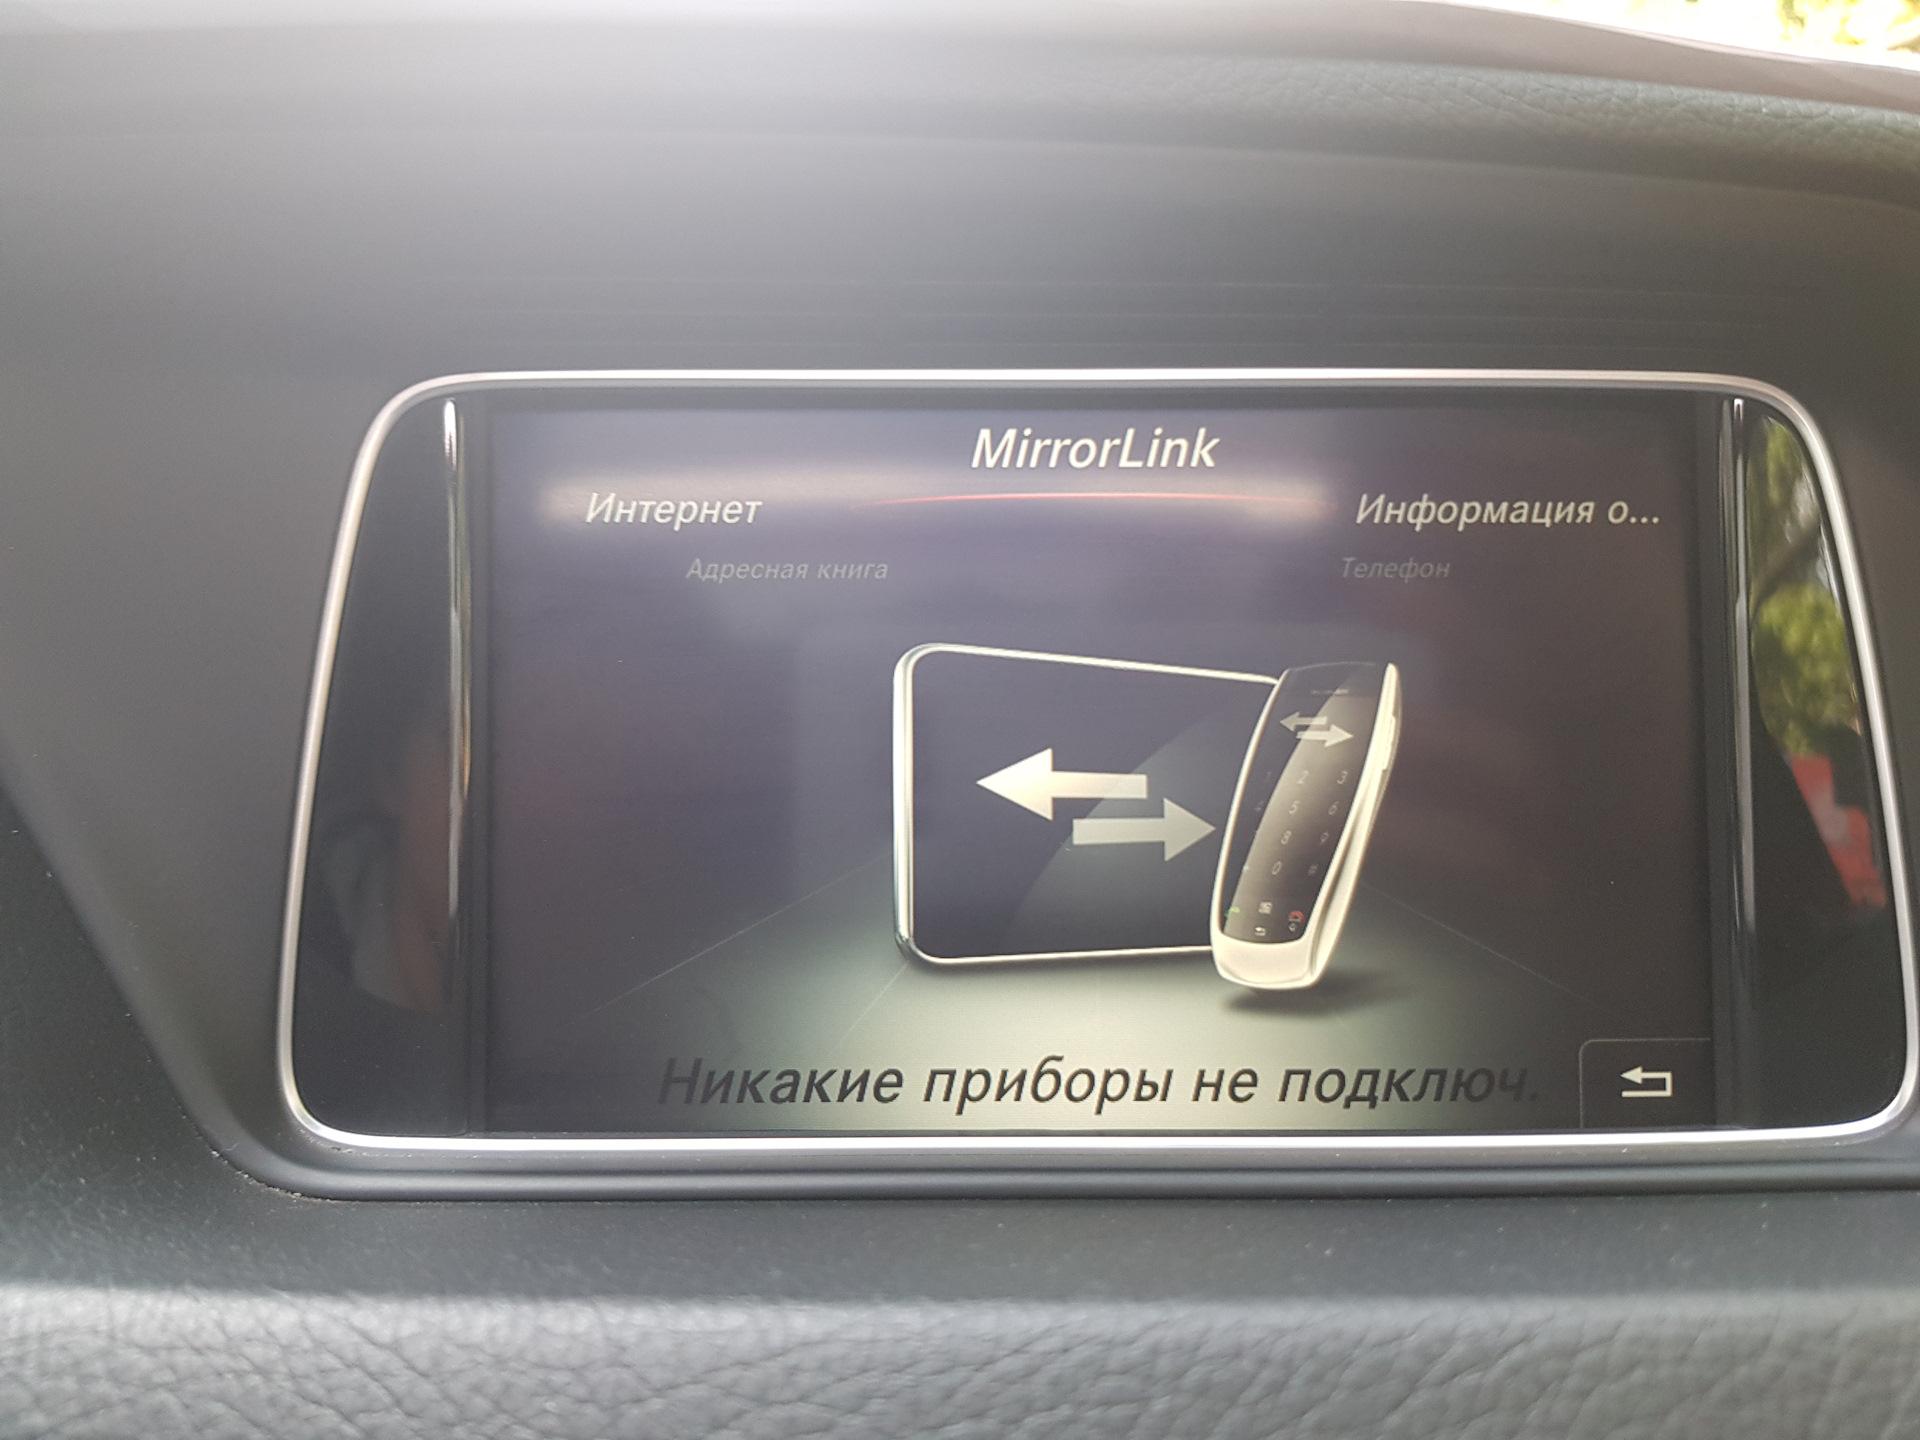 MirrorLink Comand 5s1 — Mercedes-Benz E-class Coupe, 3 5 л